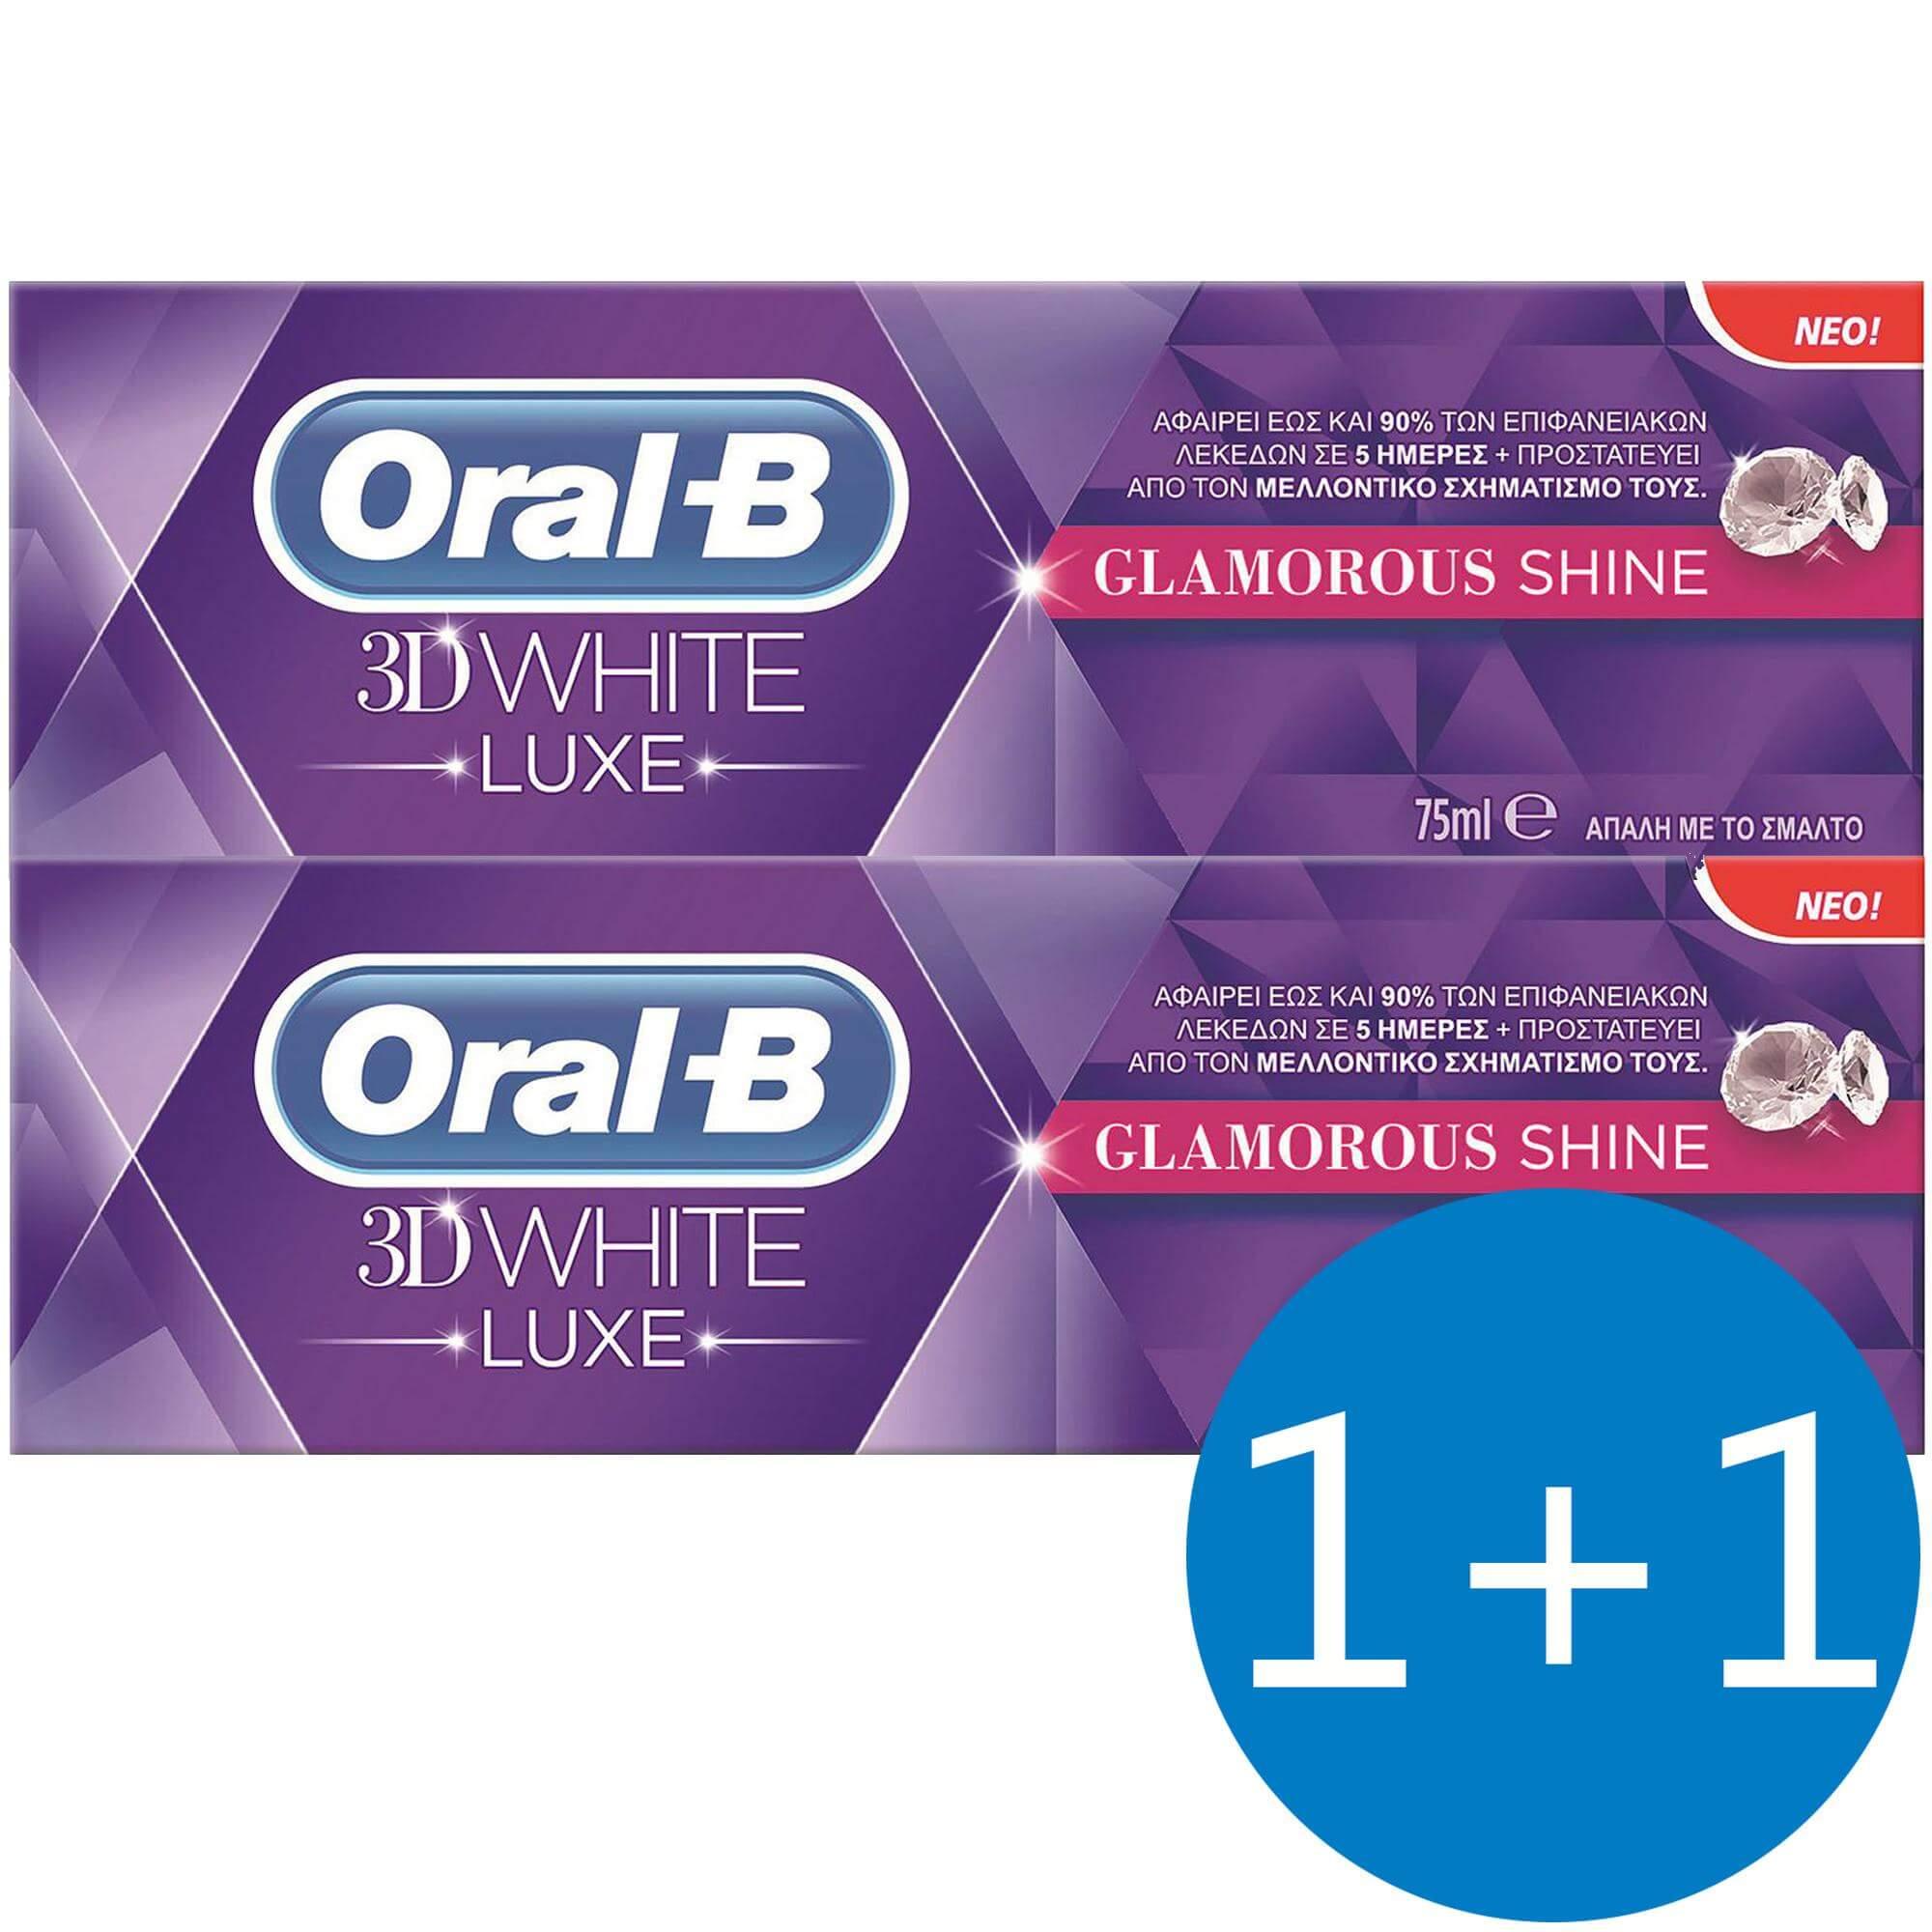 Oral-B Πακέτο Προσφοράς 3D White Luxe Glamourous Shine Οδοντόκρεμα για ως 80% Αφαίρεση των Λεκέδων 75ml Προσφορά 1+1 Δώρο